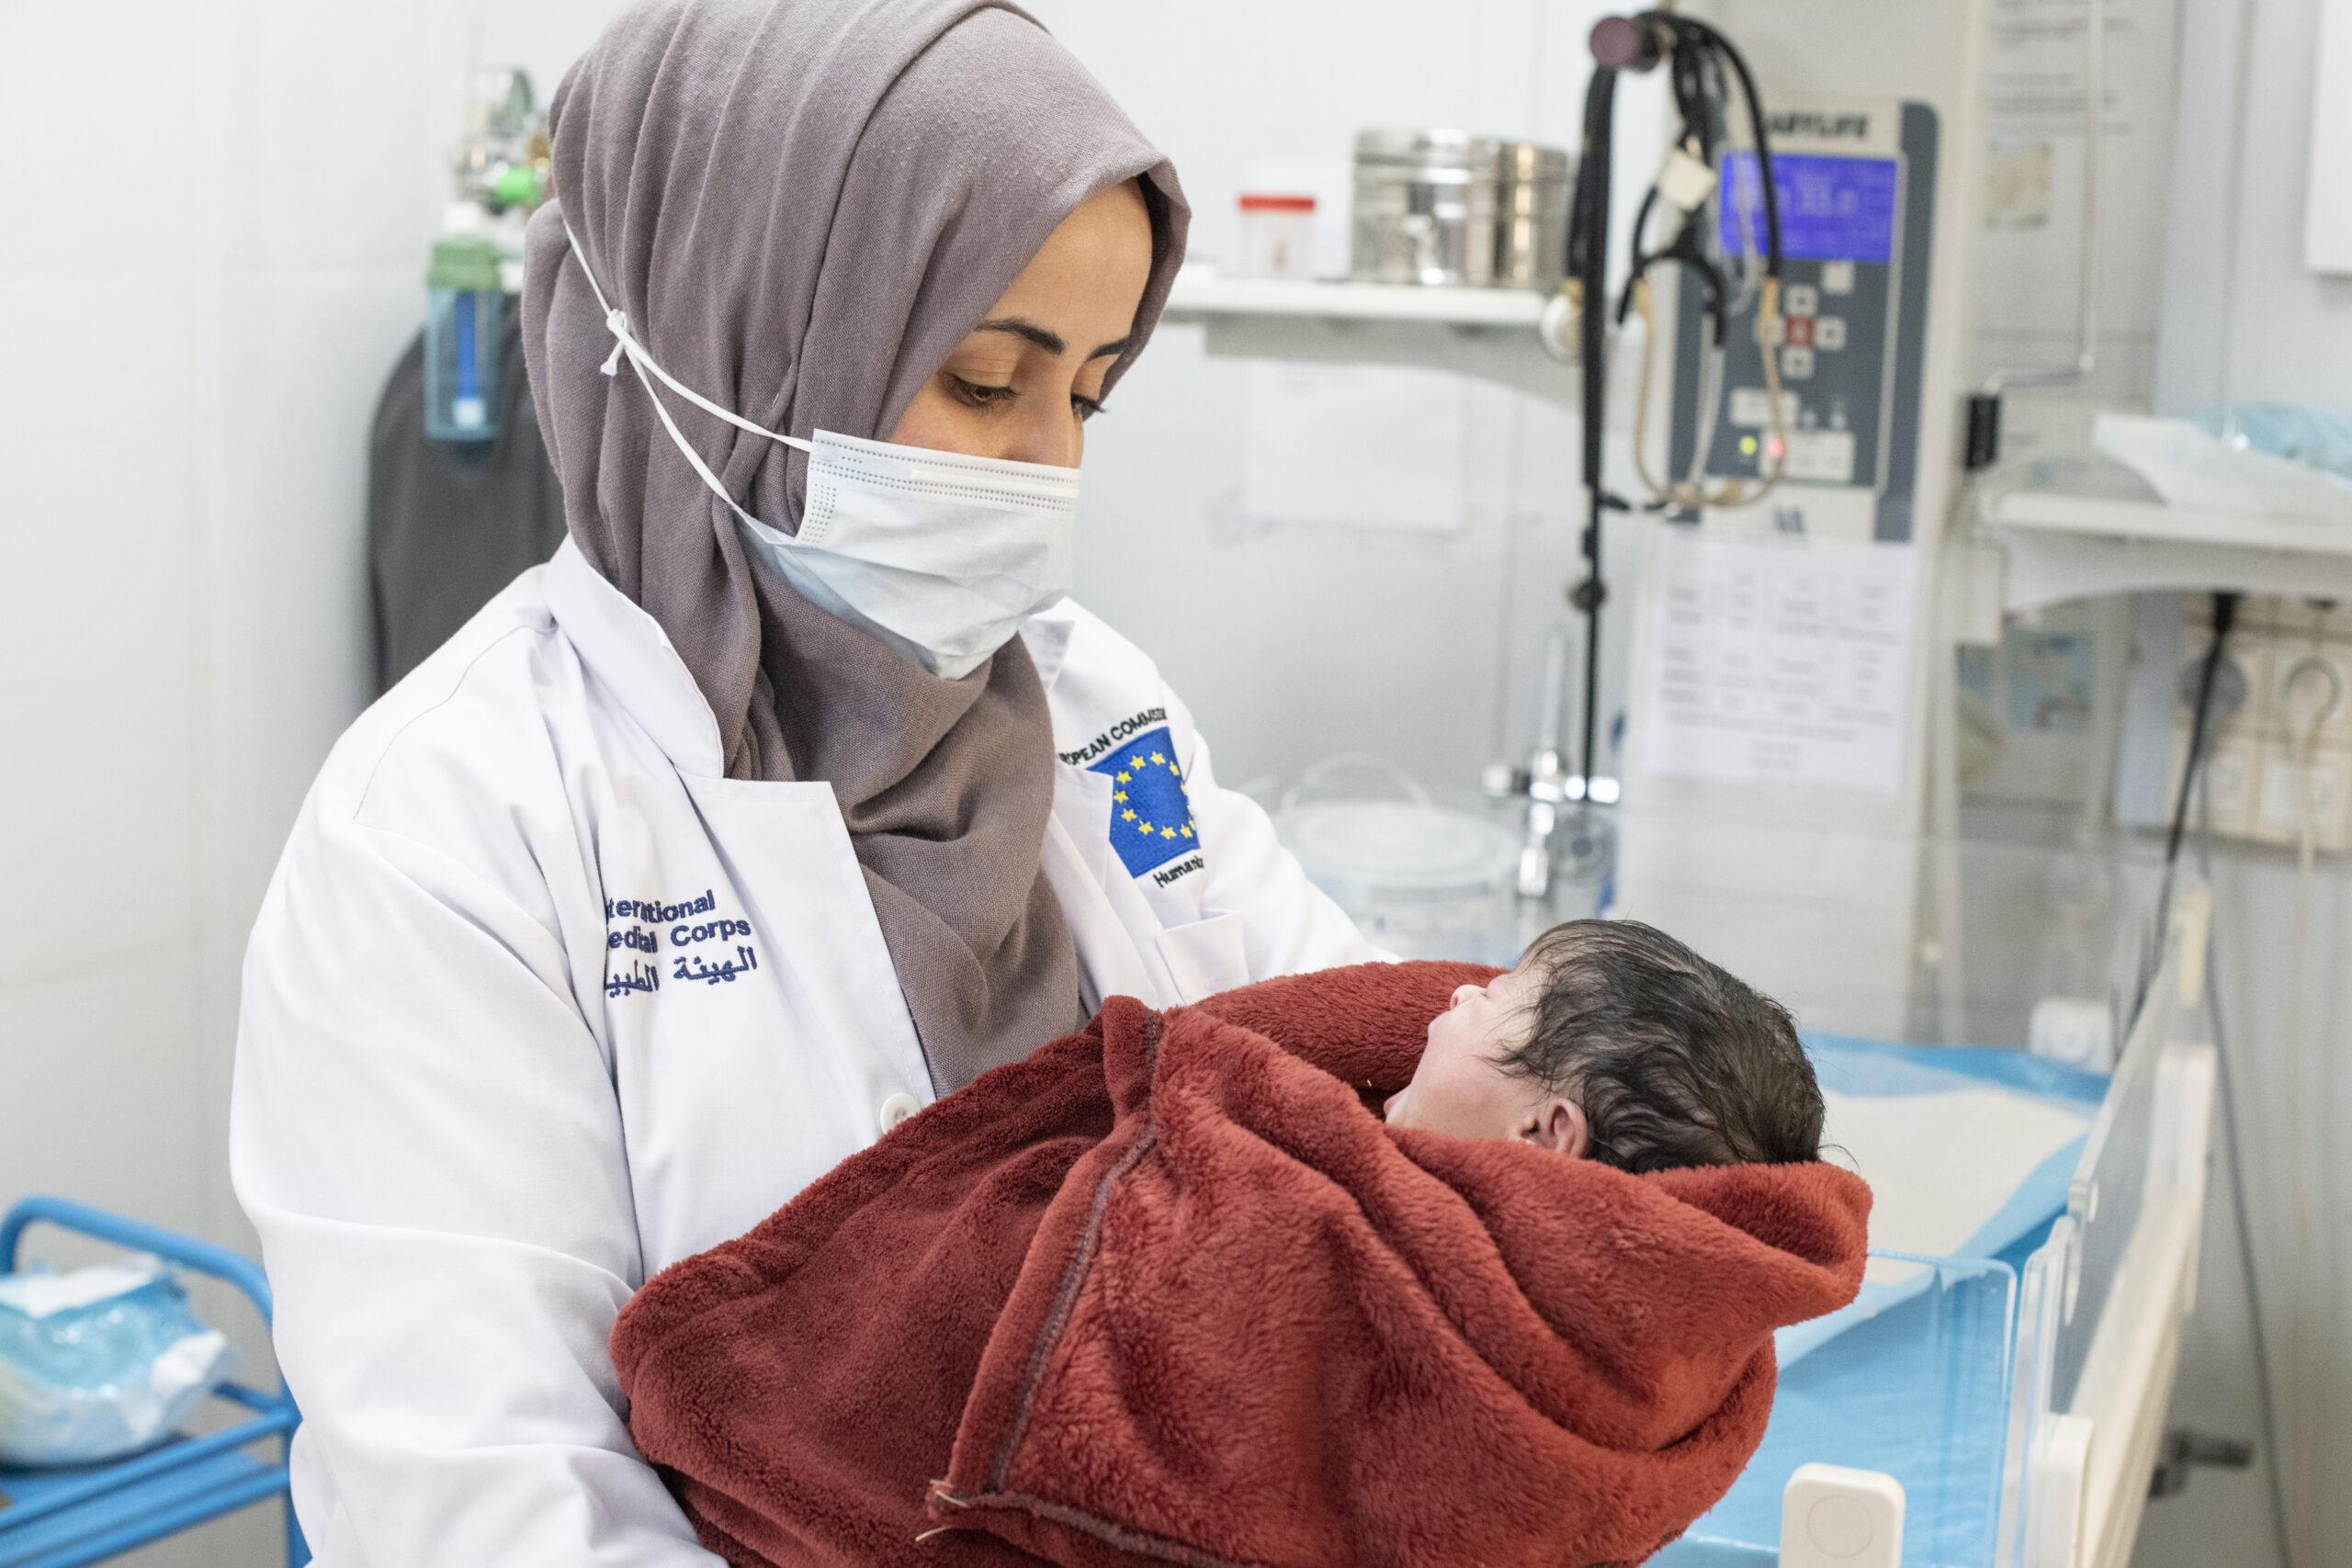 IMC nurse Rawan Al Eisi at work at the maternity ward, in Al Azraq camp hospital.